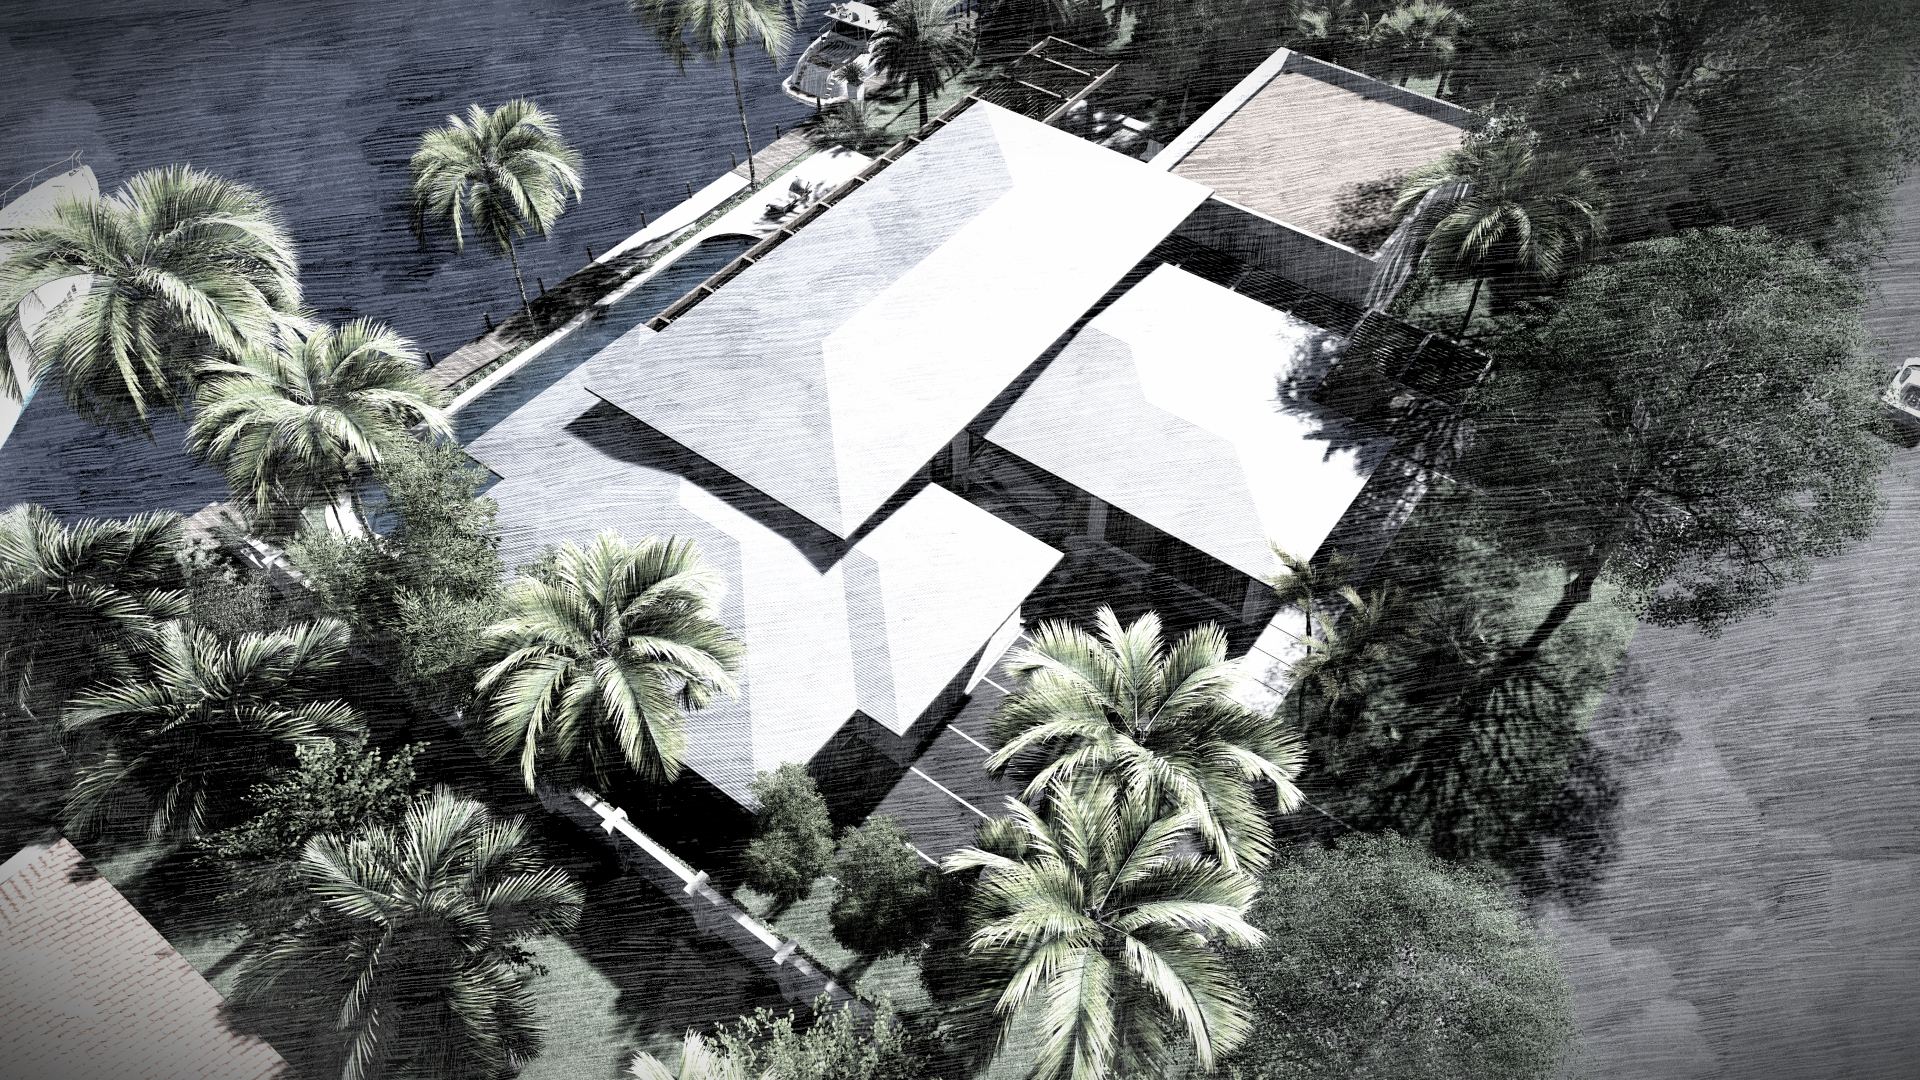 Aerial view of Harbour Beach Miami, FL Contemporary Residence by KoDA Miami